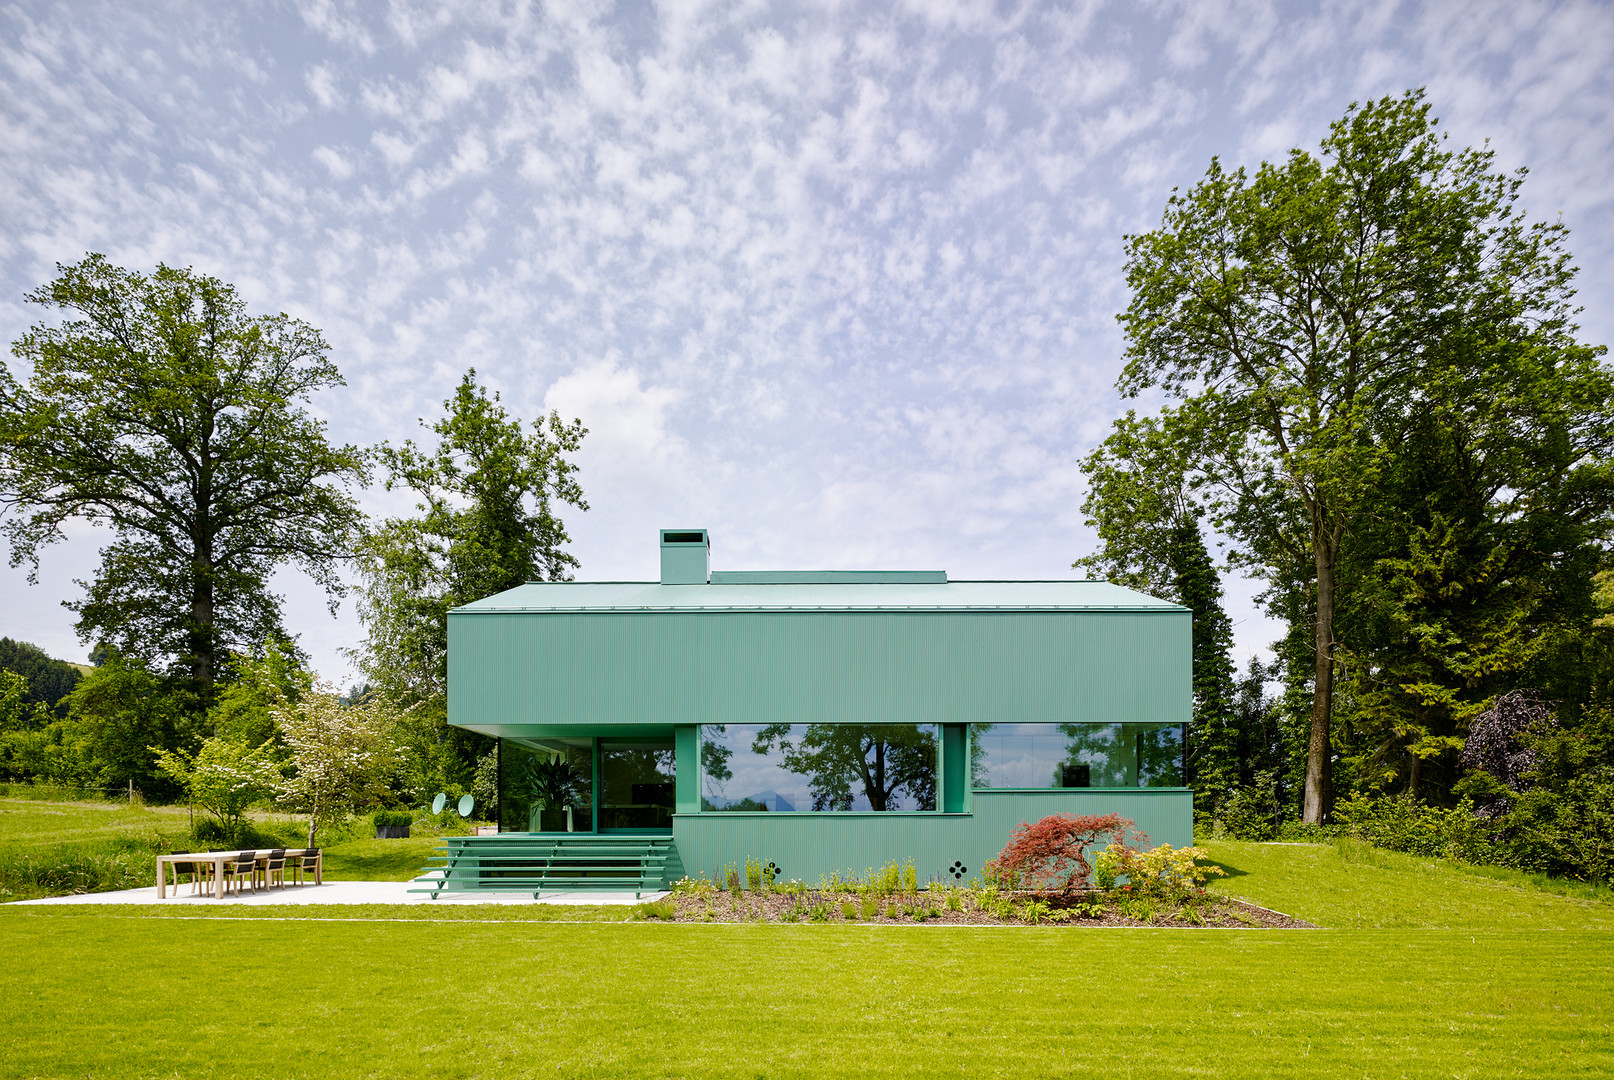 Einfamilienhaus | Seemättli